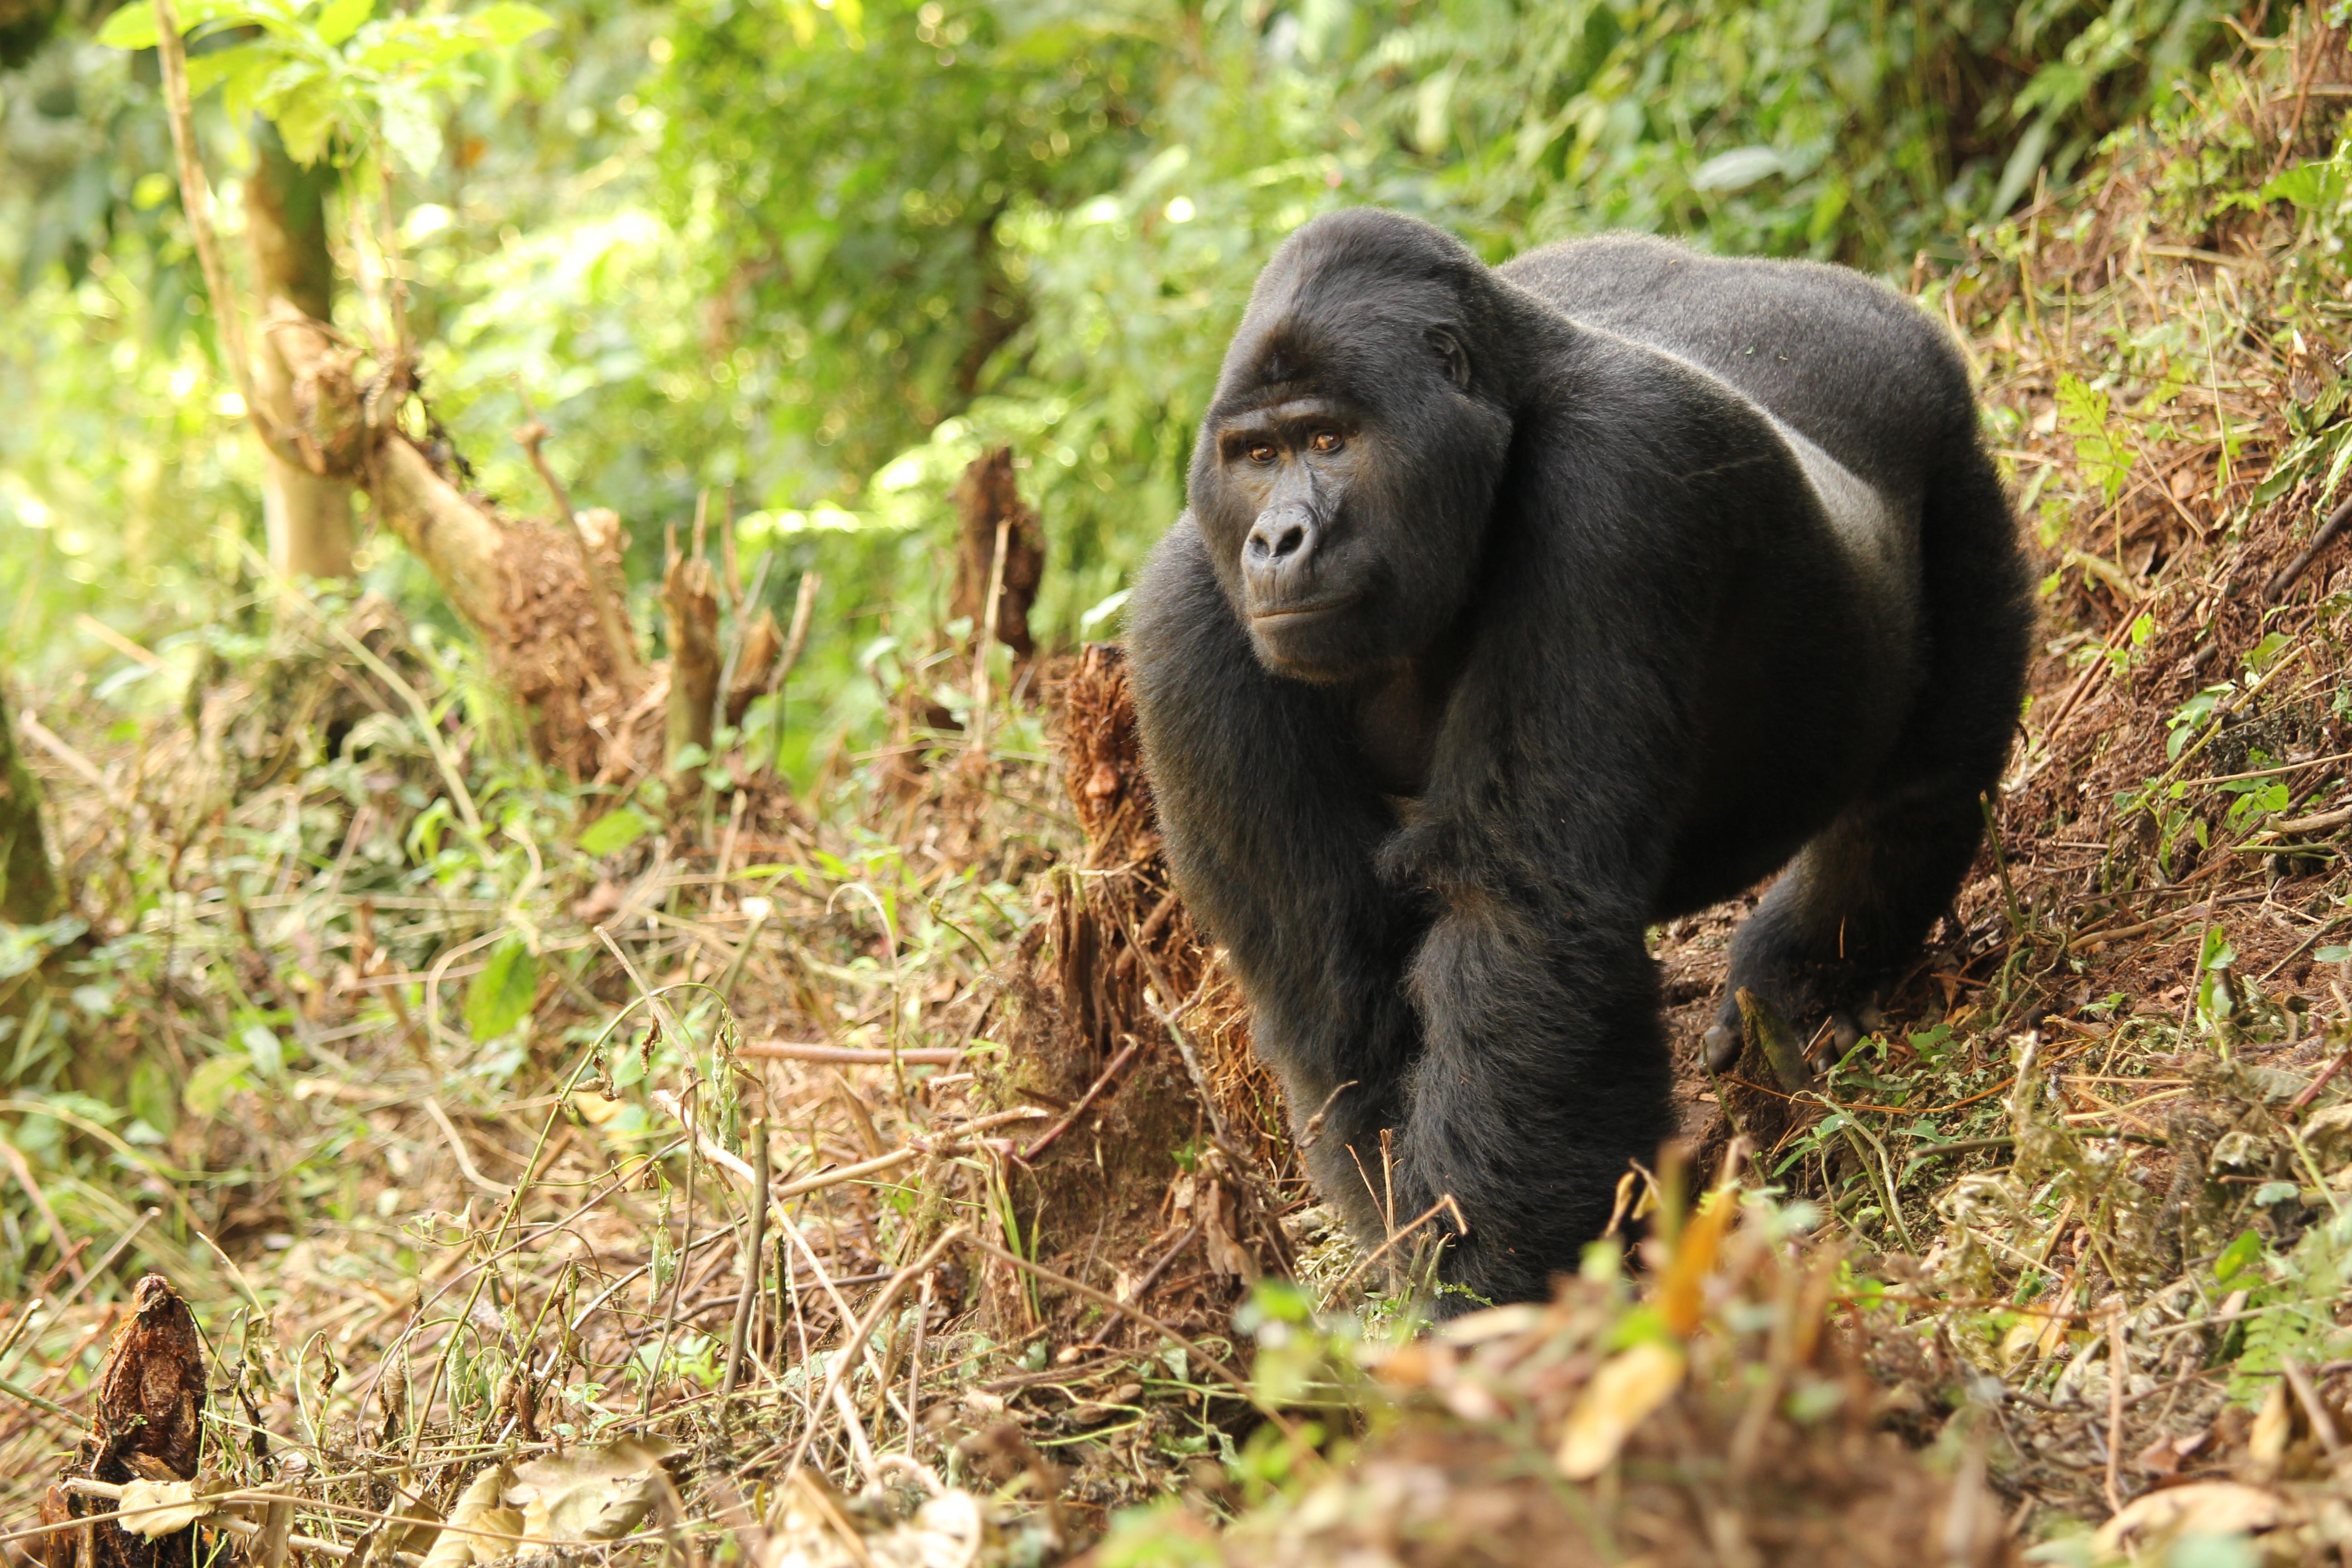 Gorillas, Chimps & Shoebill Storks of Uganda with Dr. Mark Brazil